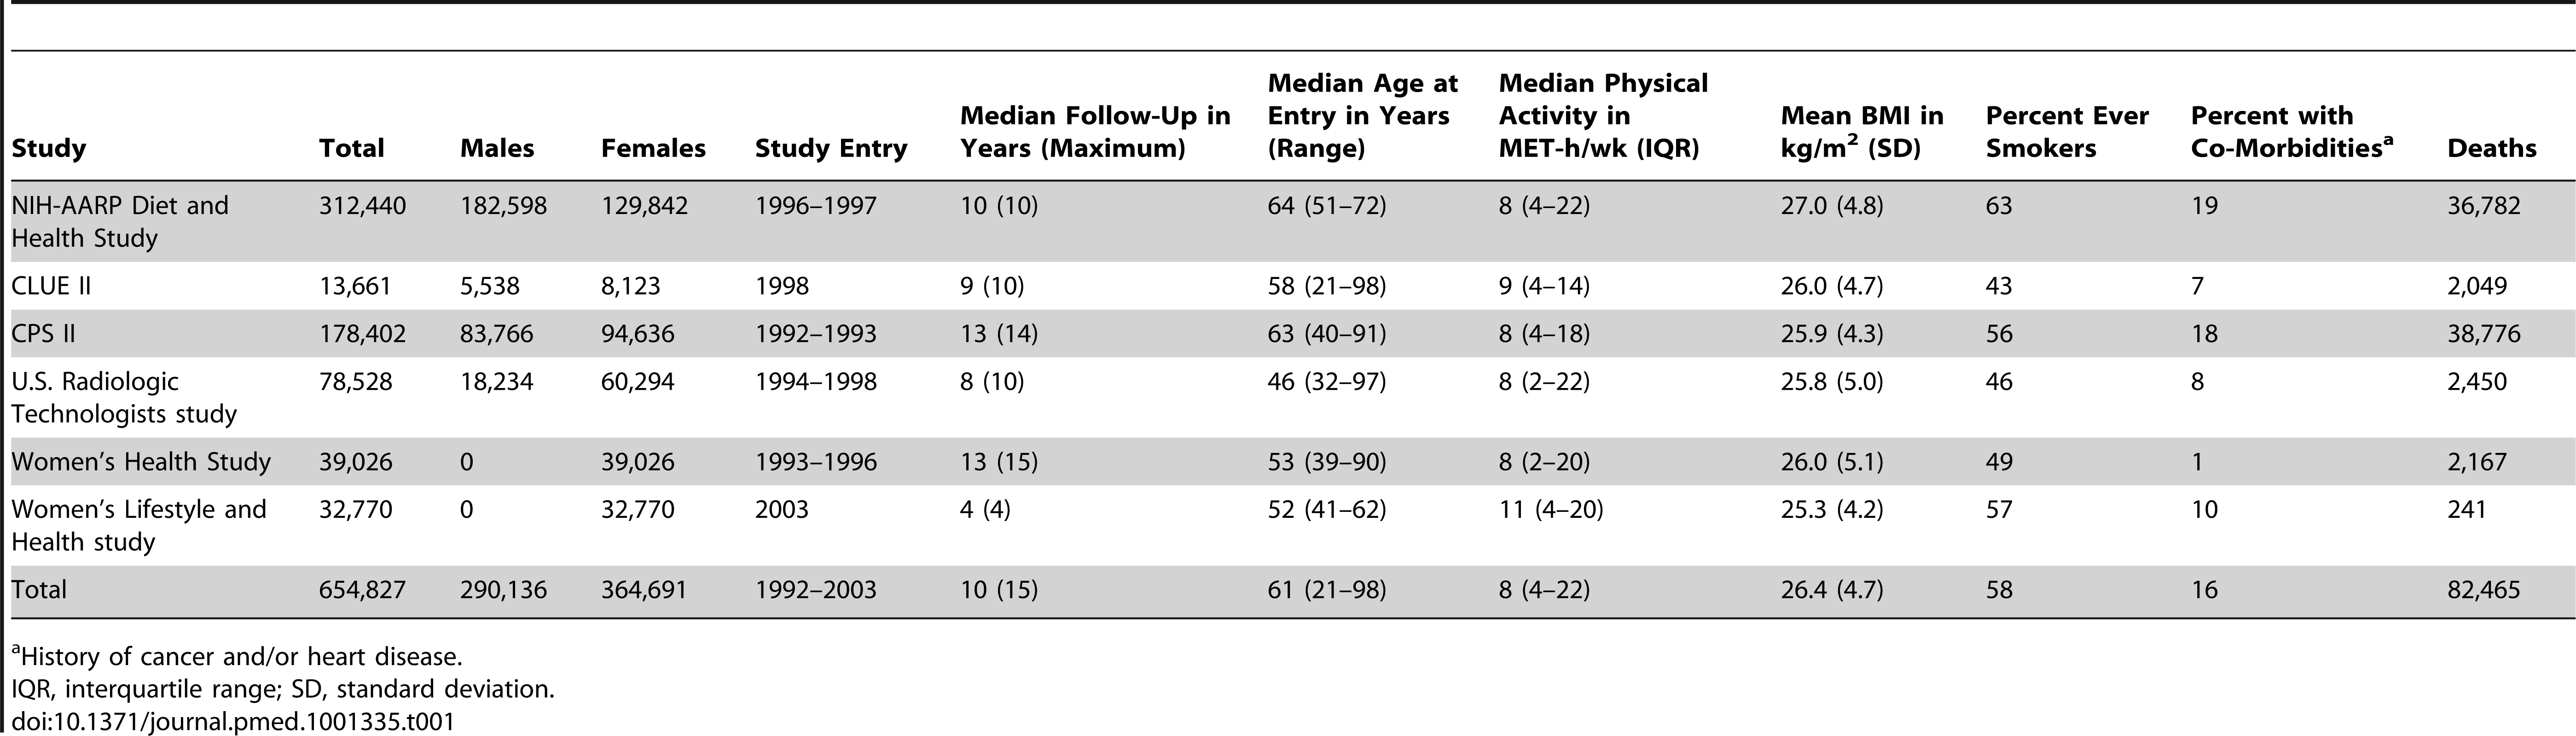 Selected characteristics according to prospective cohort study.